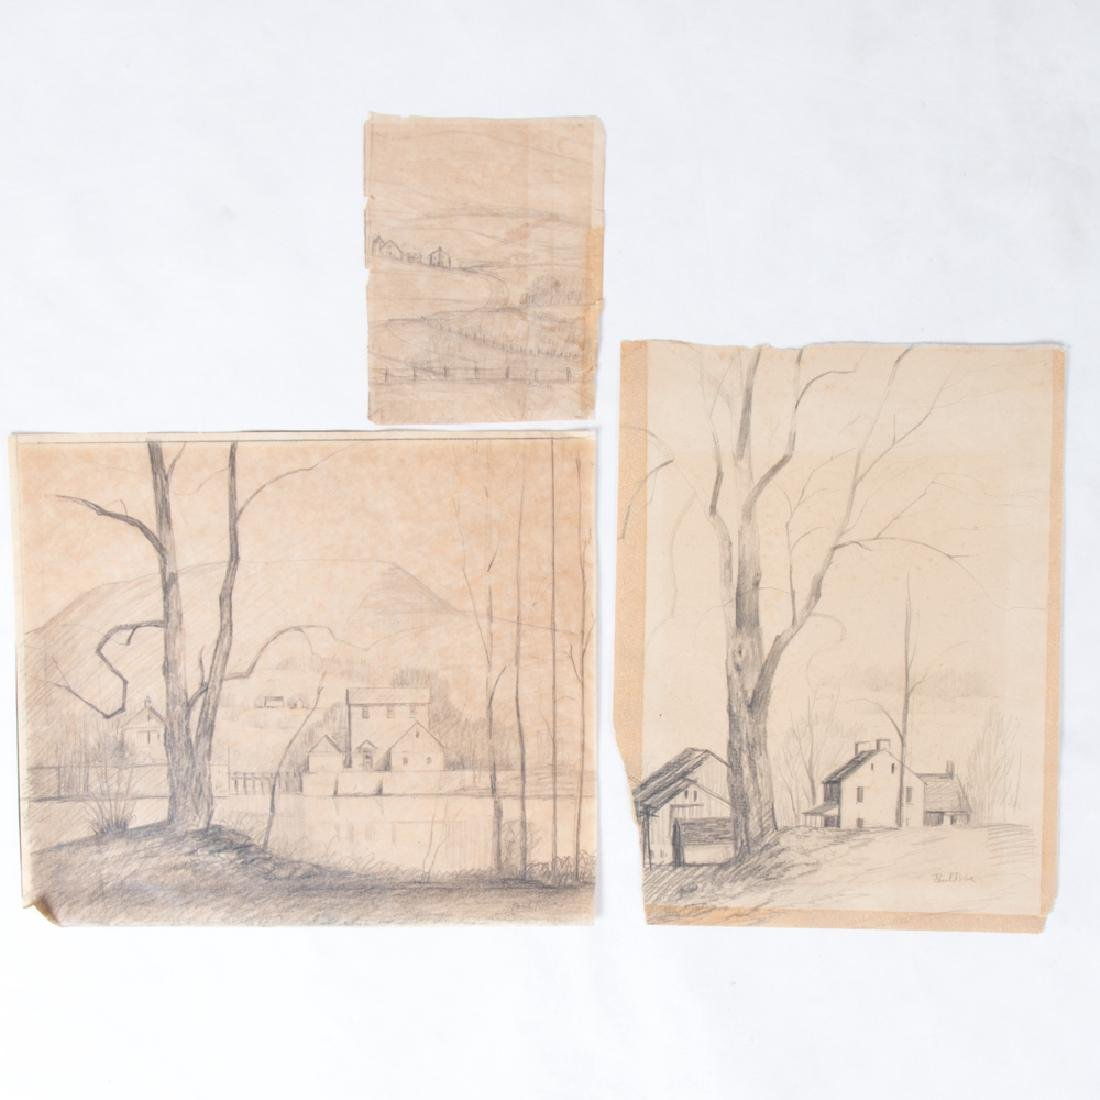 Paul Riba (1912-1977) A Group of Three Studies, Pencil